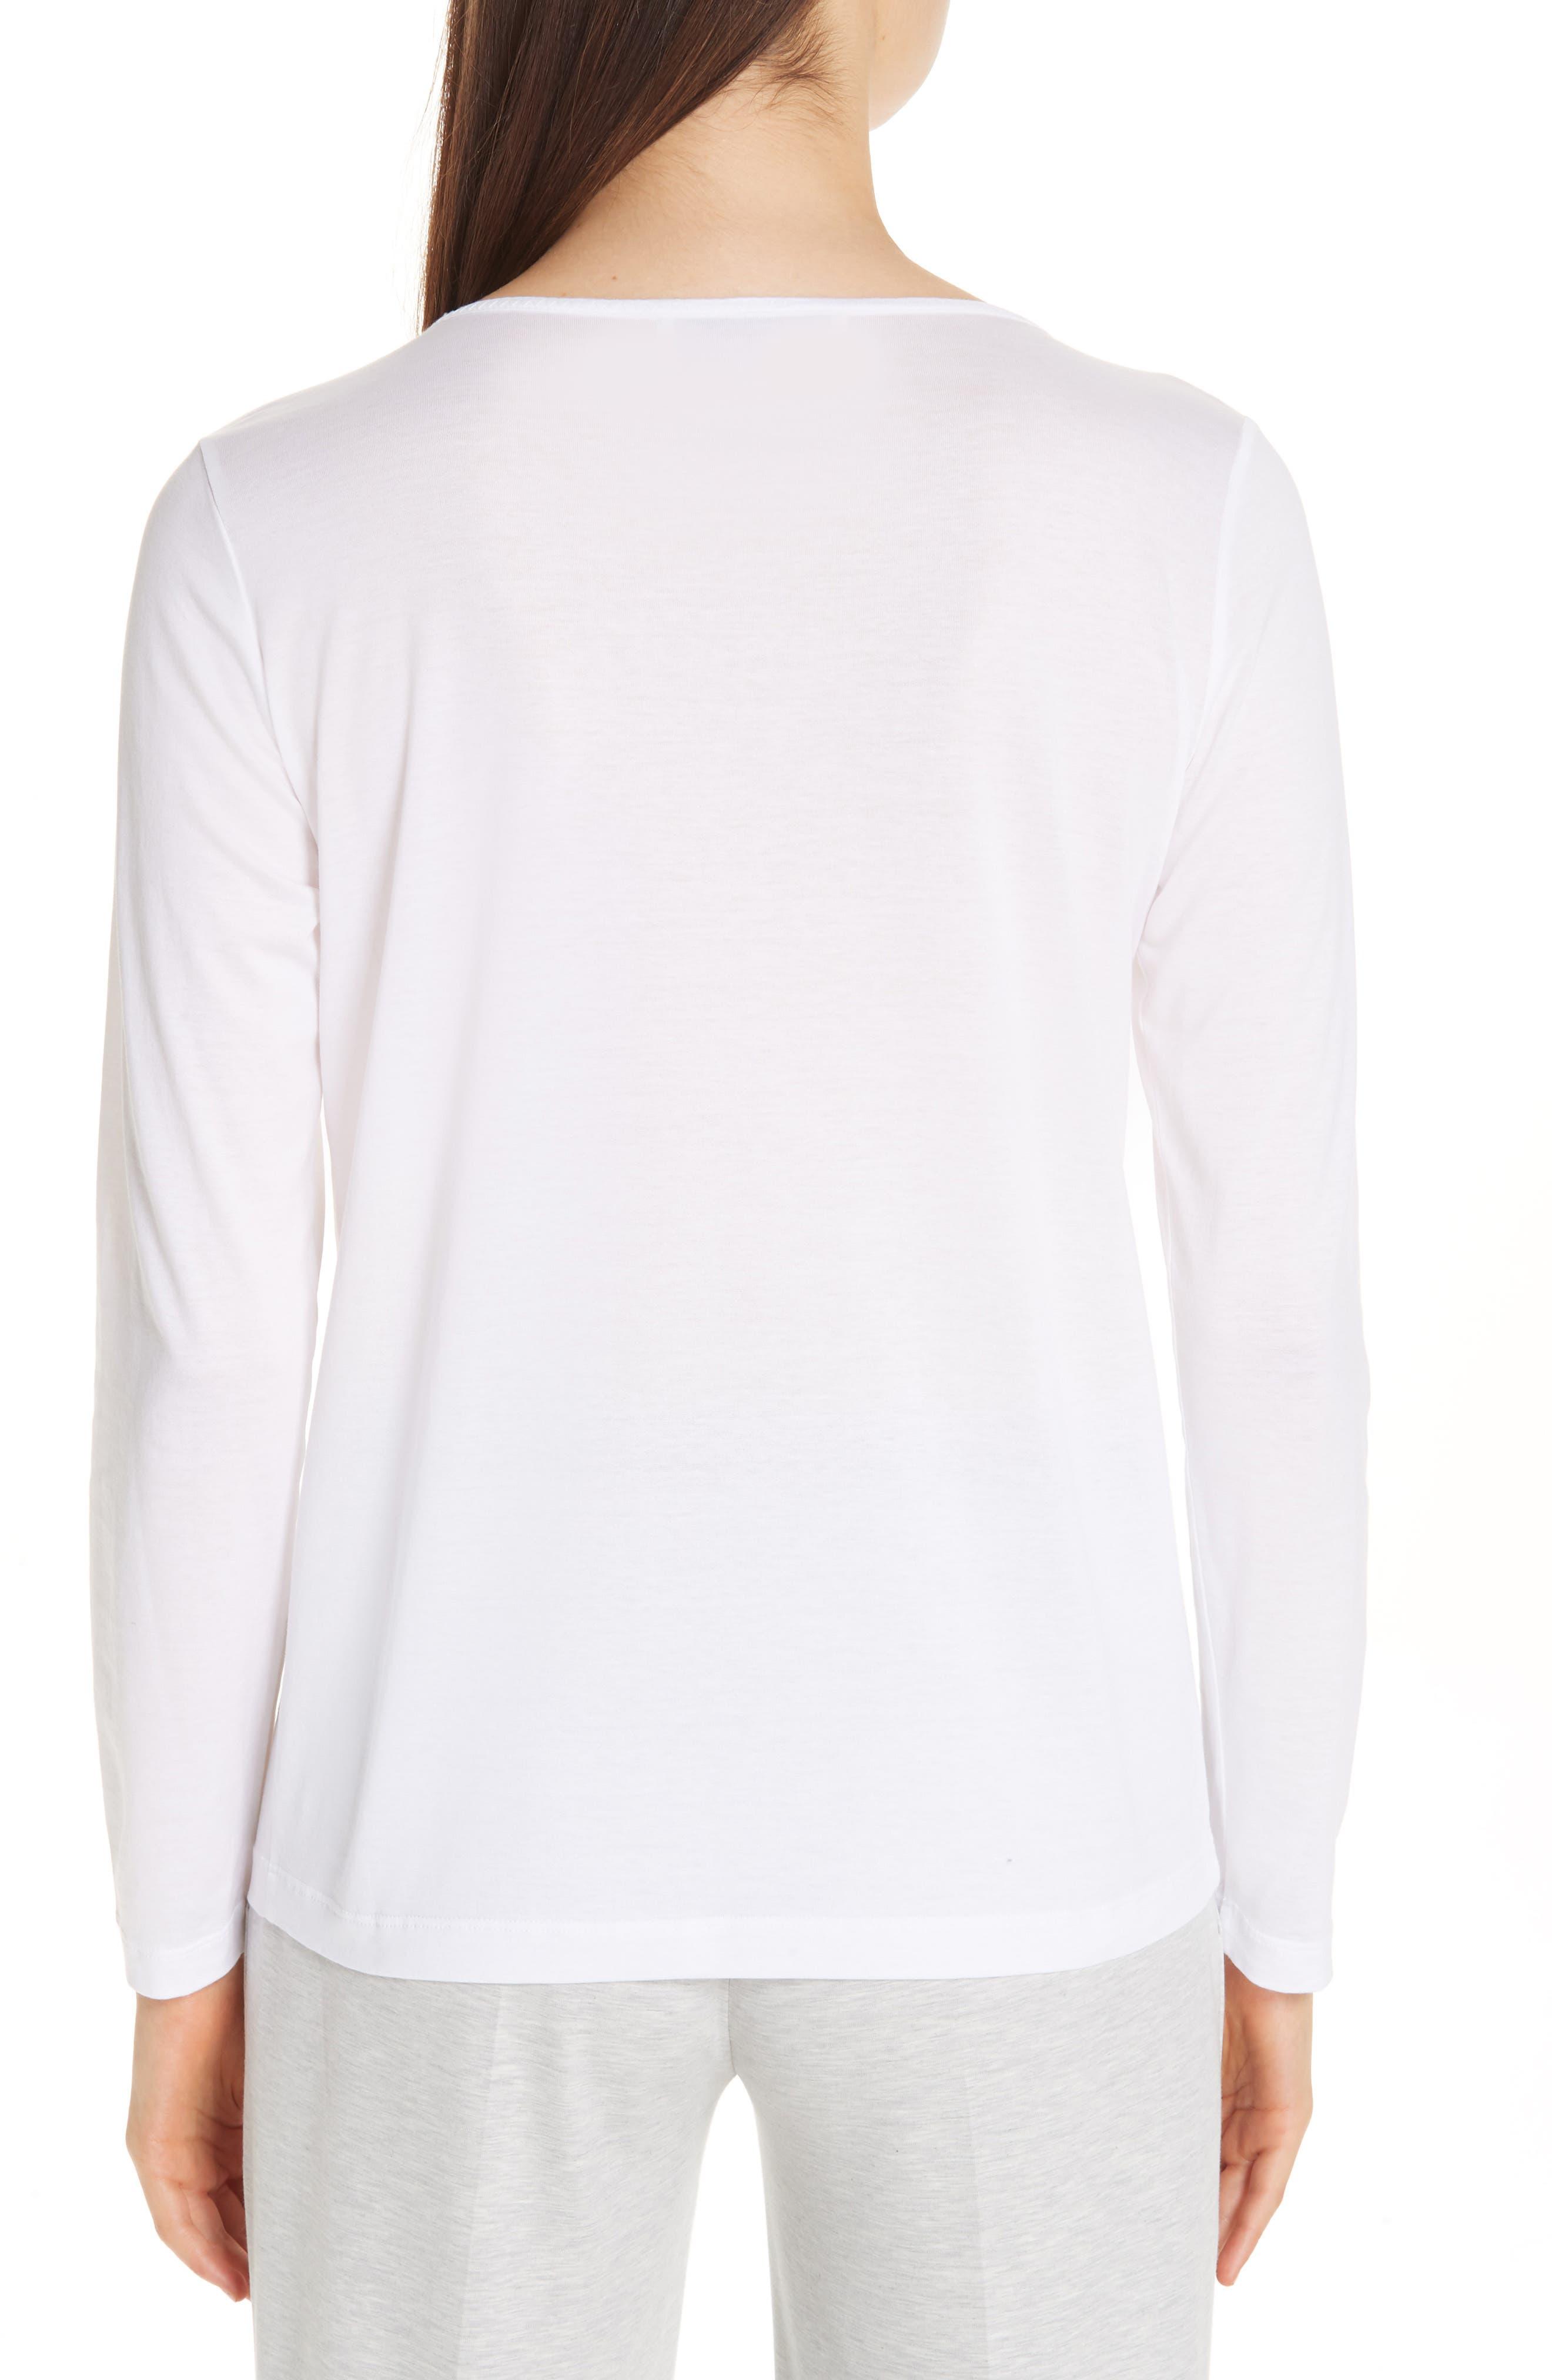 FABIANA FILIPPI, Chain Trim Jersey Top, Alternate thumbnail 2, color, WHITE